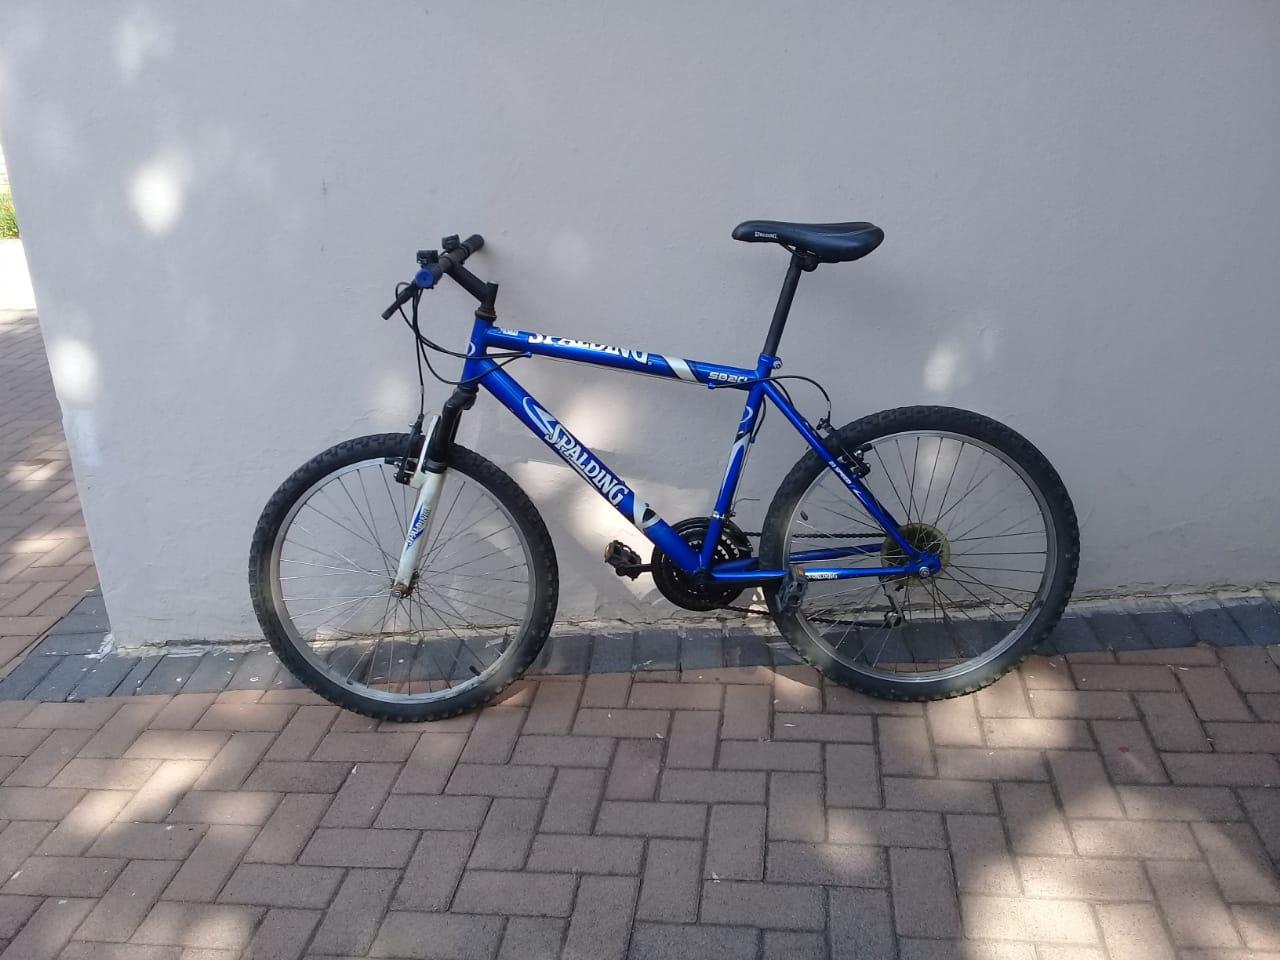 2012 Salding SB20 Mountain bike